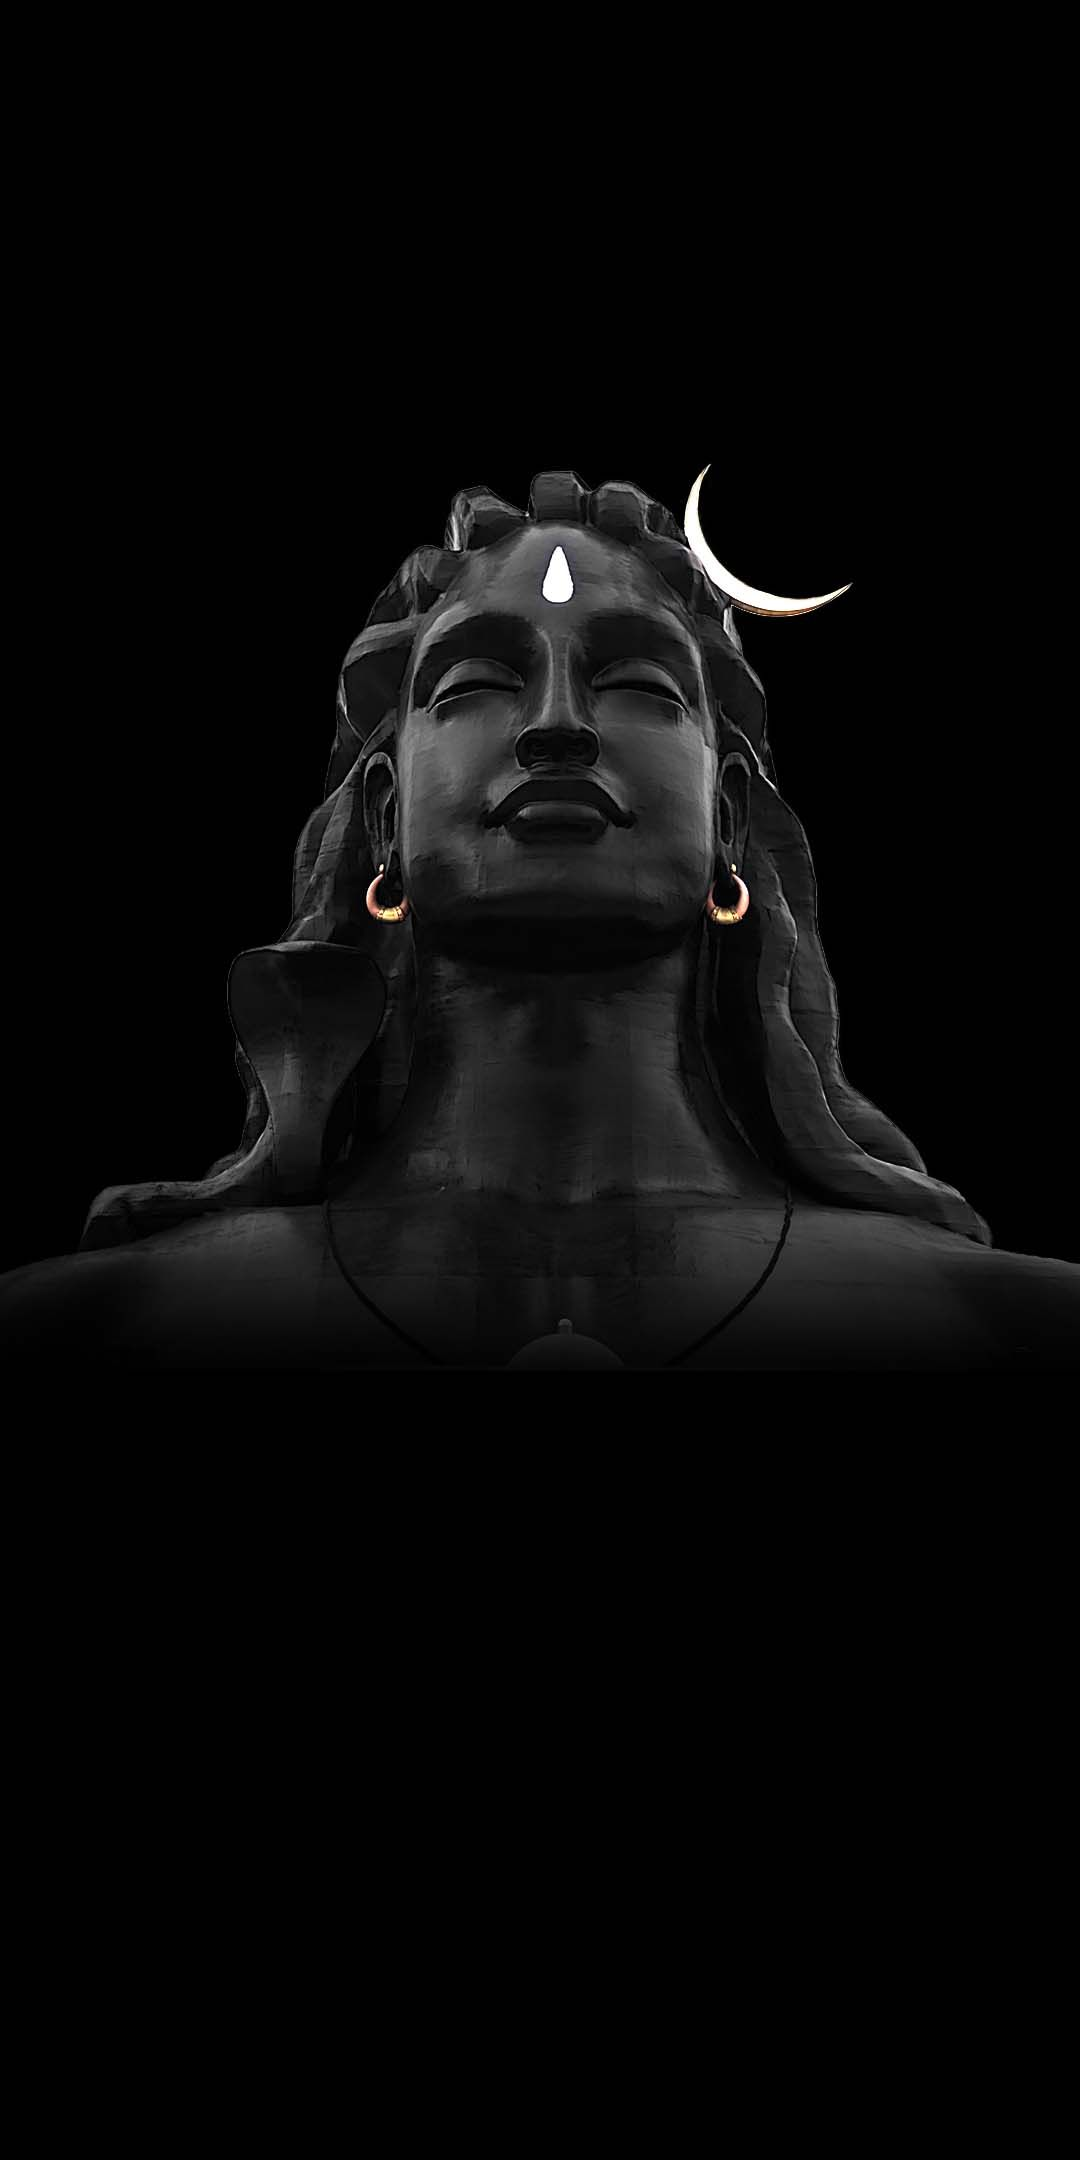 Lord Shiva Shiva Lord Wallpapers Lord Shiva Lord Shiva Hd Wallpaper